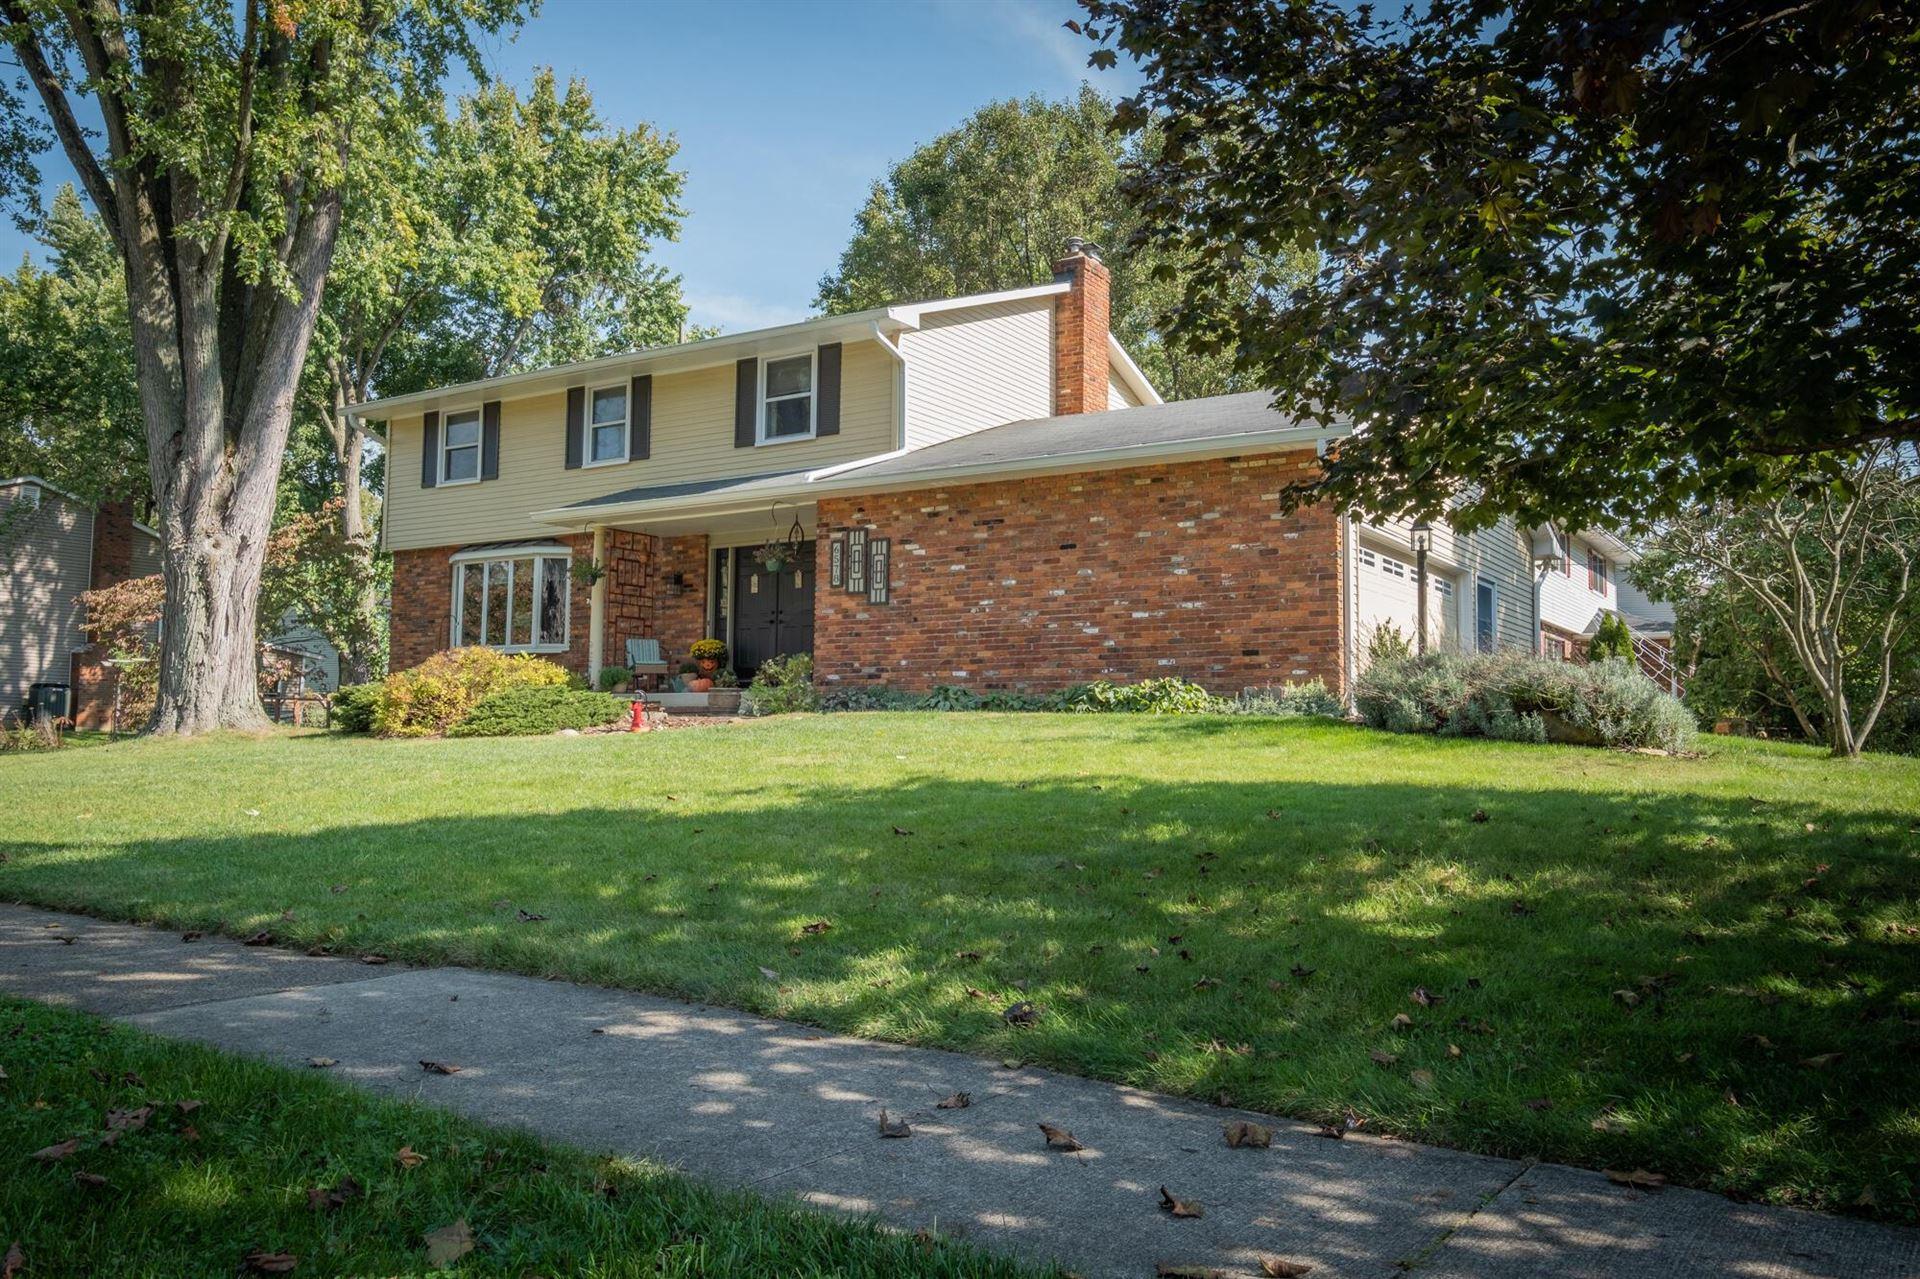 Photo of 6578 Masefield Street, Worthington, OH 43085 (MLS # 221040704)